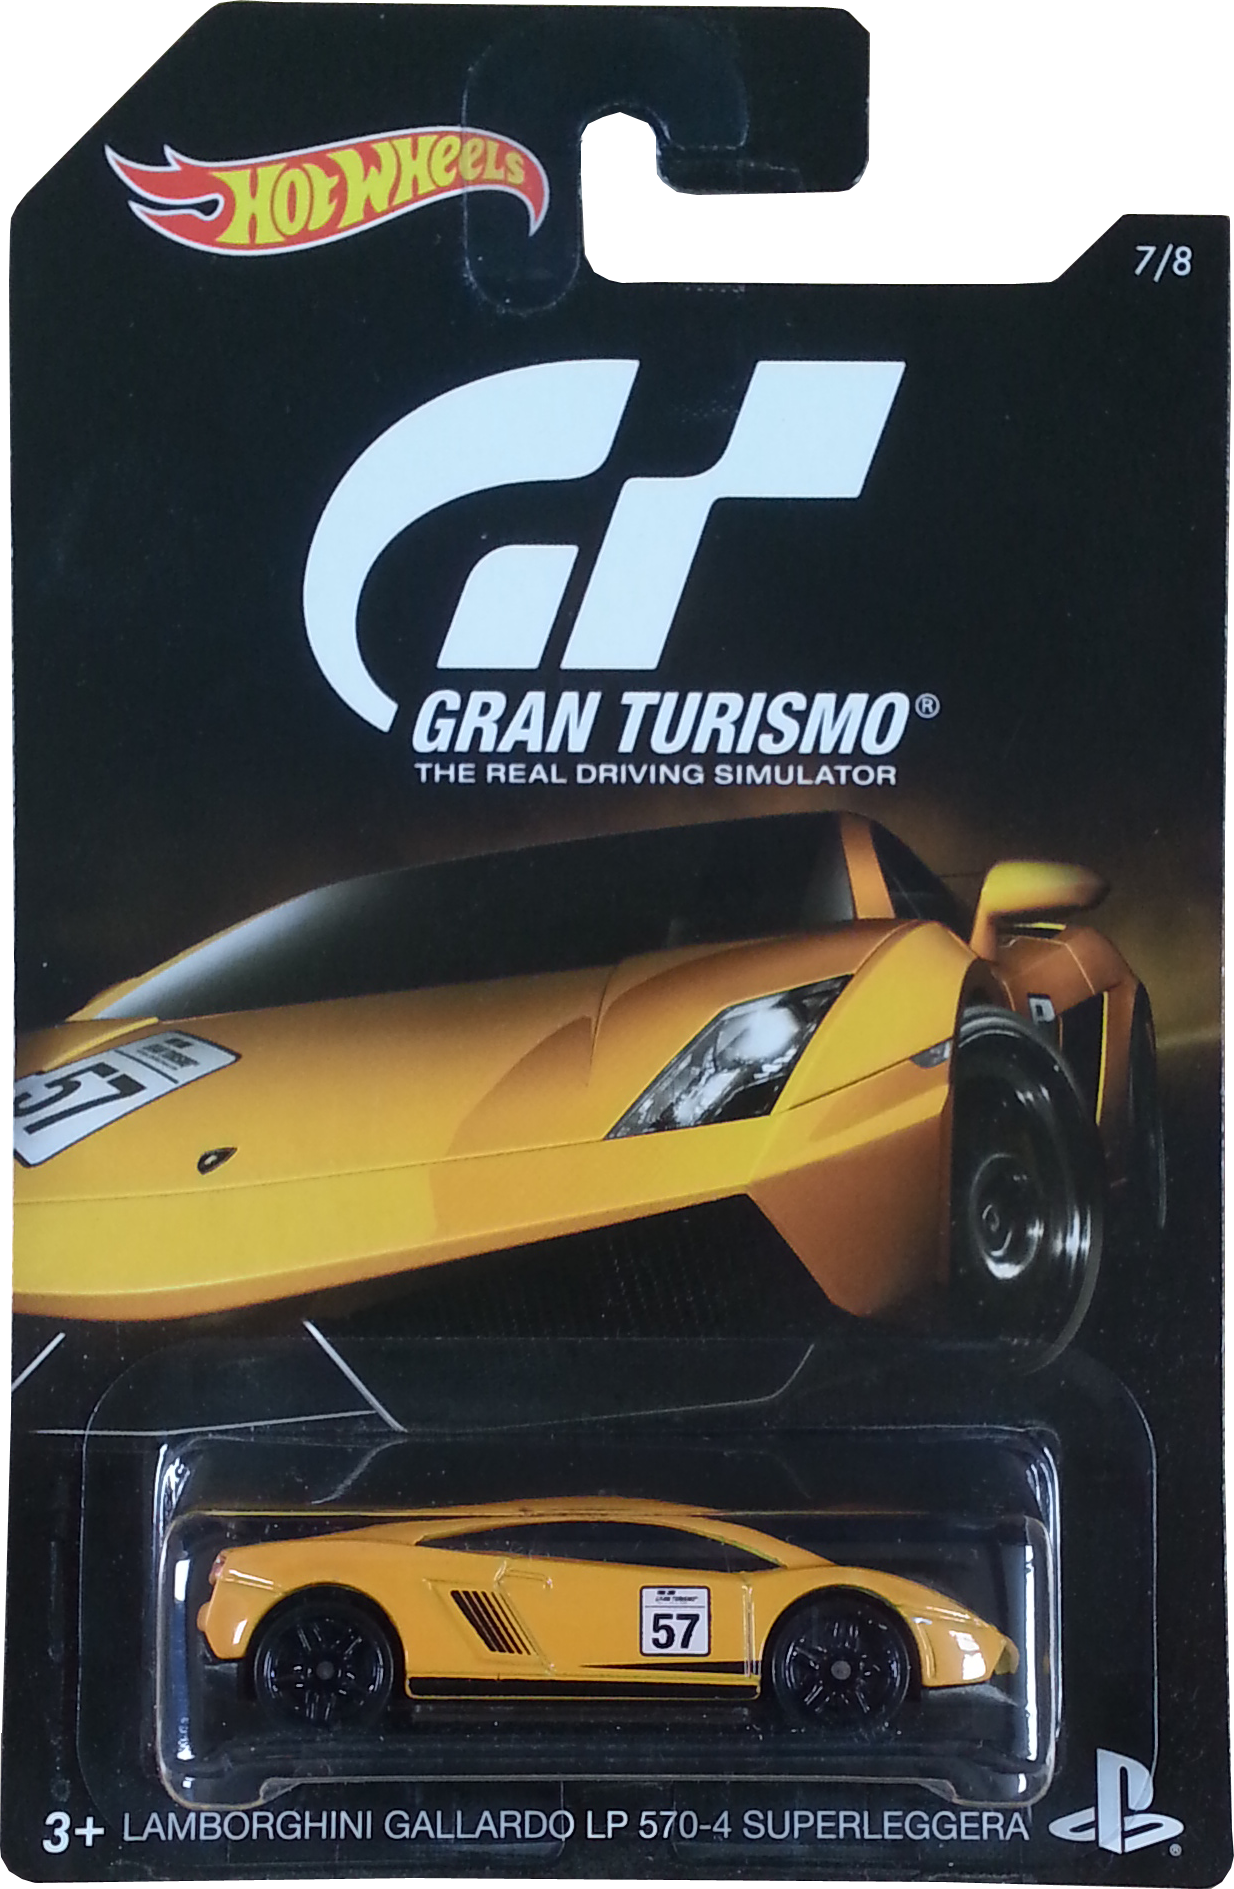 latest?cb=20160820142017 Surprising Lamborghini Gallardo Hot Wheels Wiki Cars Trend